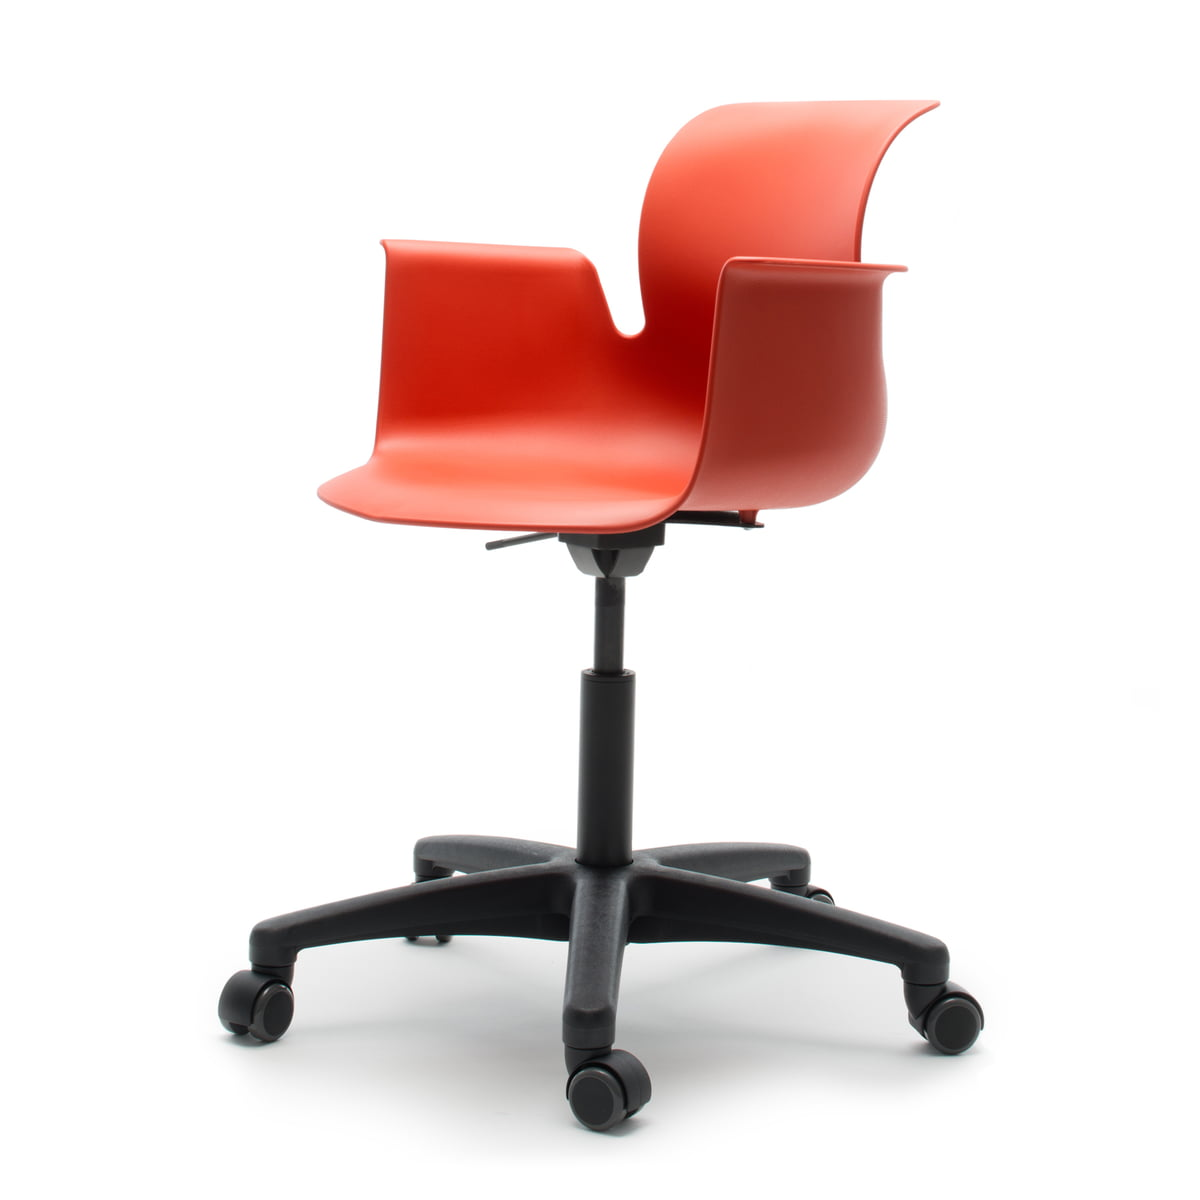 Strange Flototto Pro 6 Swivel Armchair Polyamide Graphite Black Soft Castors With Black Caps Beatyapartments Chair Design Images Beatyapartmentscom